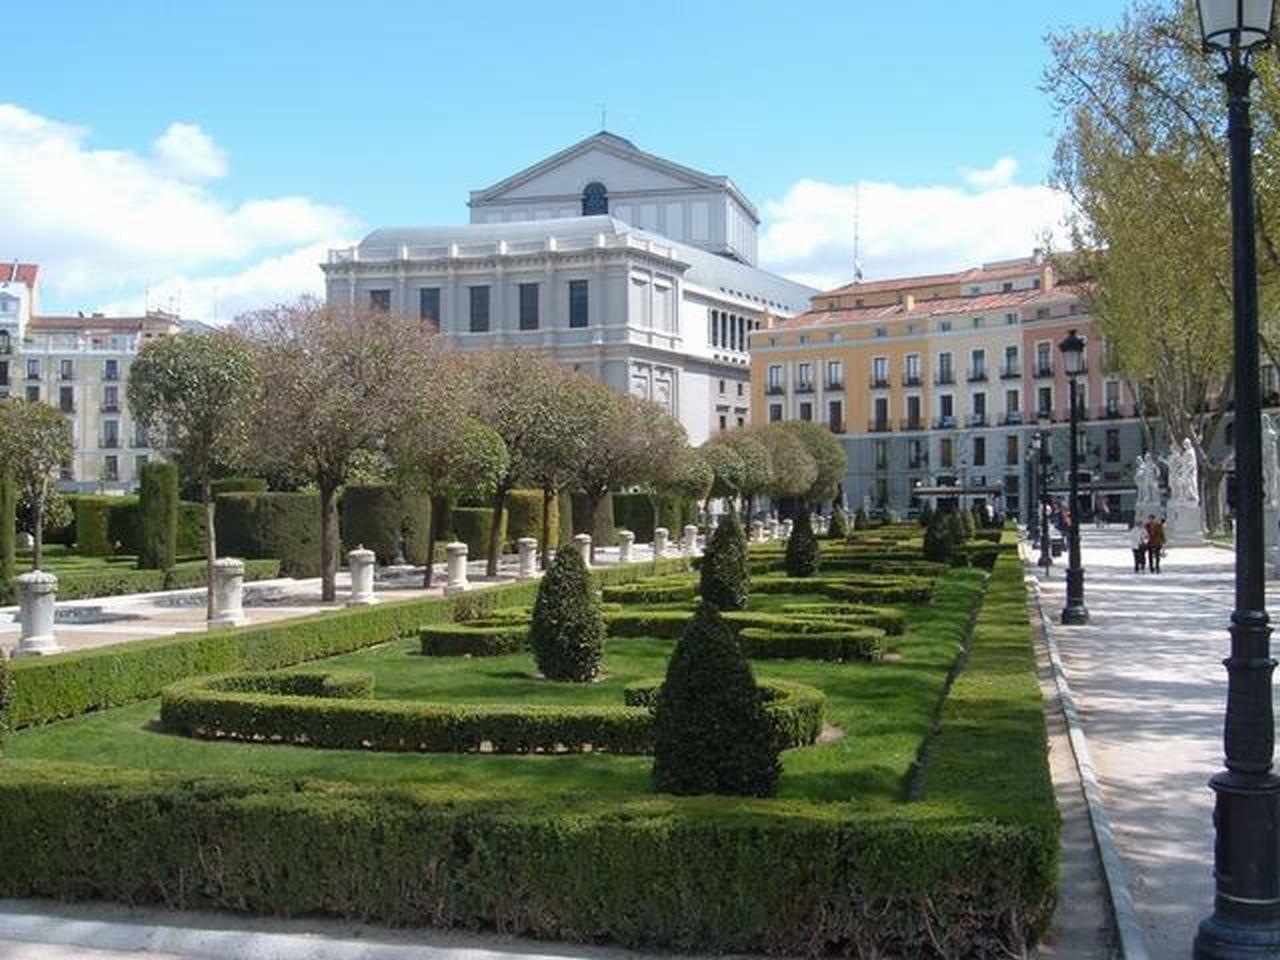 Plaza de Oriente Madrid сквер